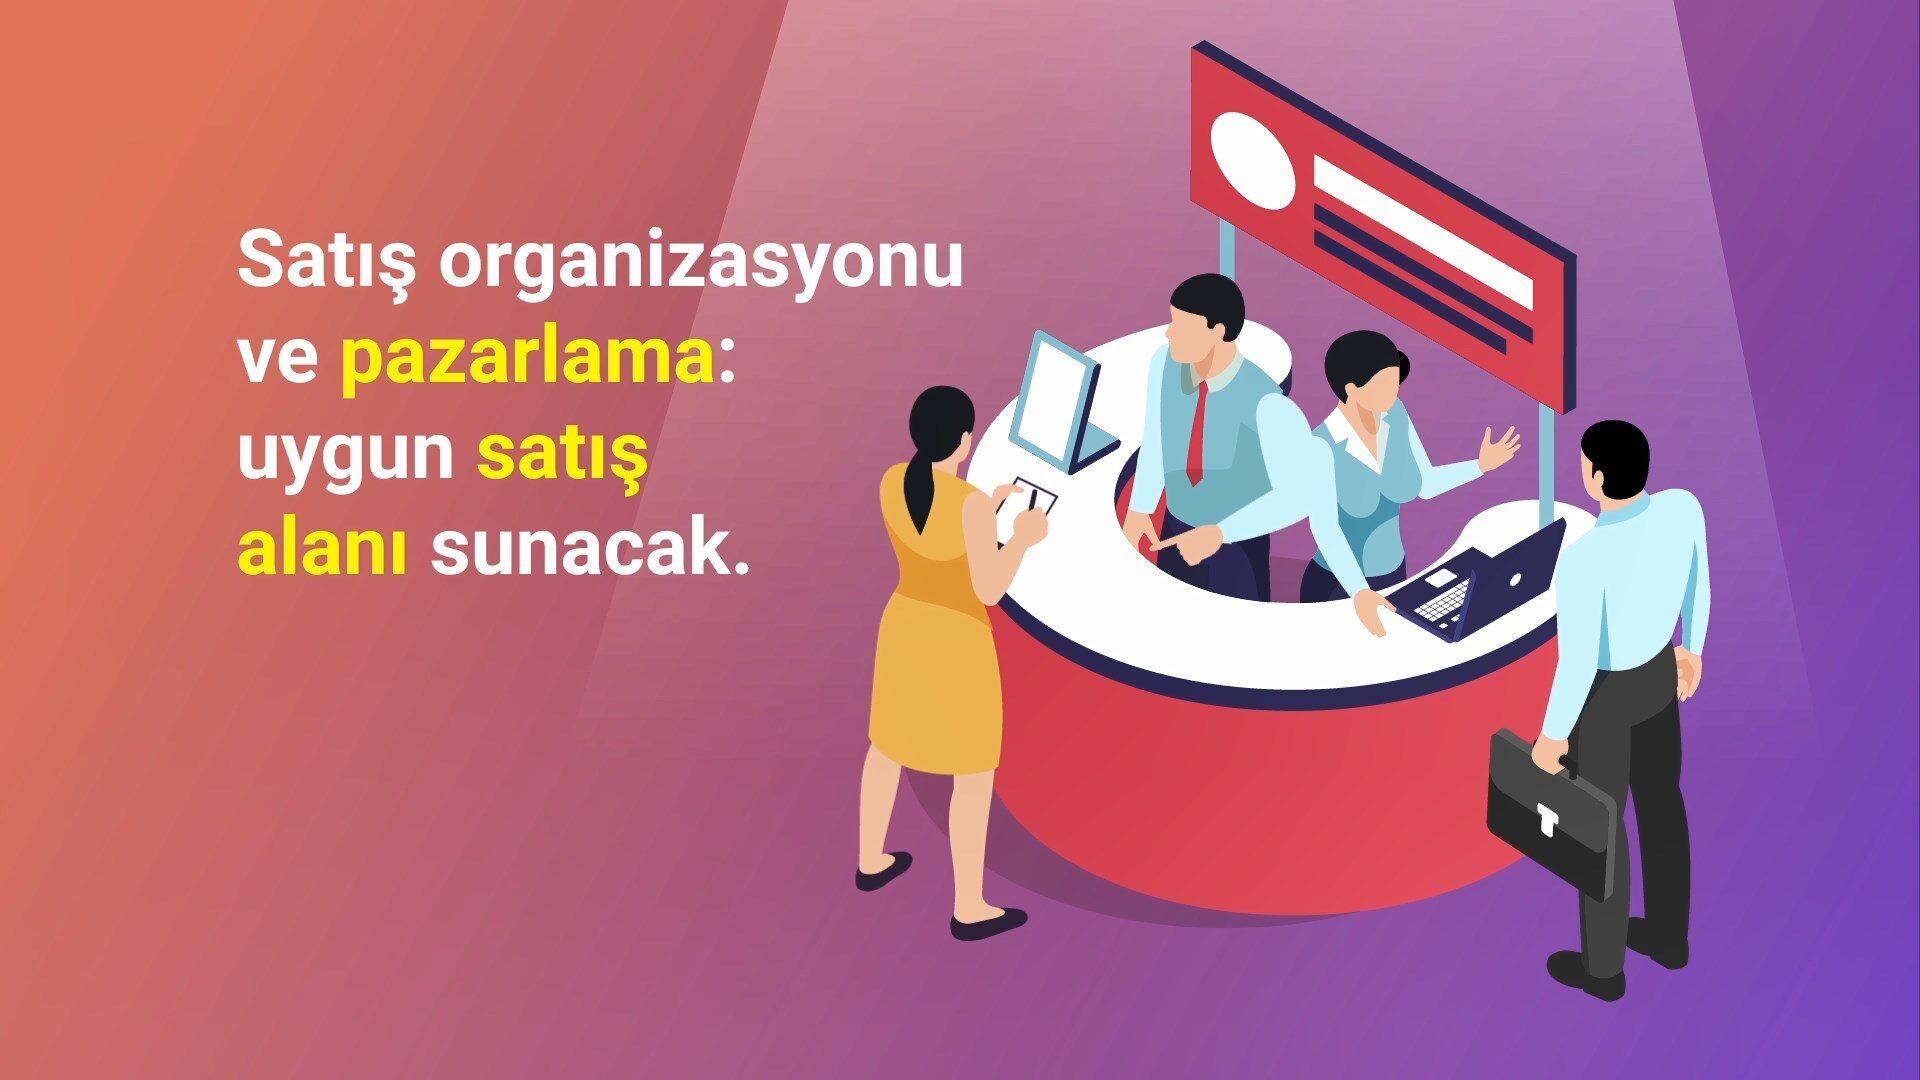 TürkTicaretMerkezi4.mp4 snapshot 00.26.175 1920x1080 -